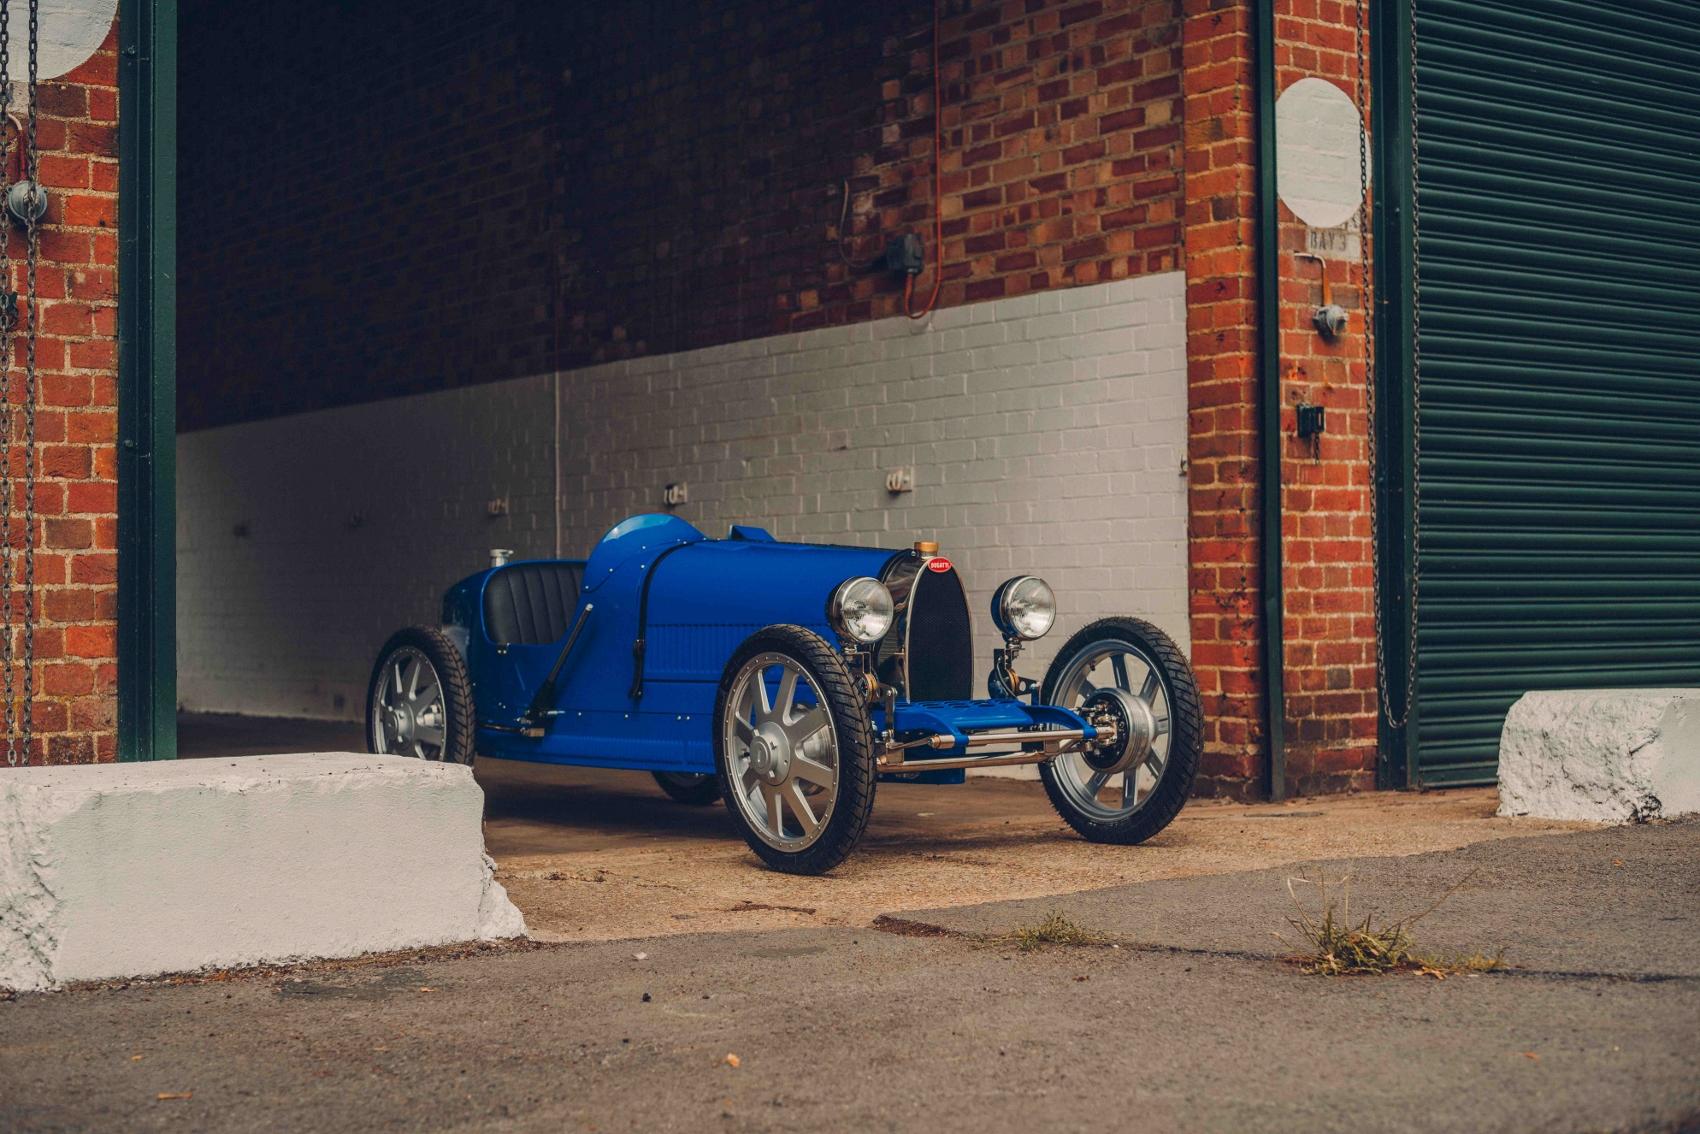 A Bugatti Baby II awaiting its next test drive (1700x1134)